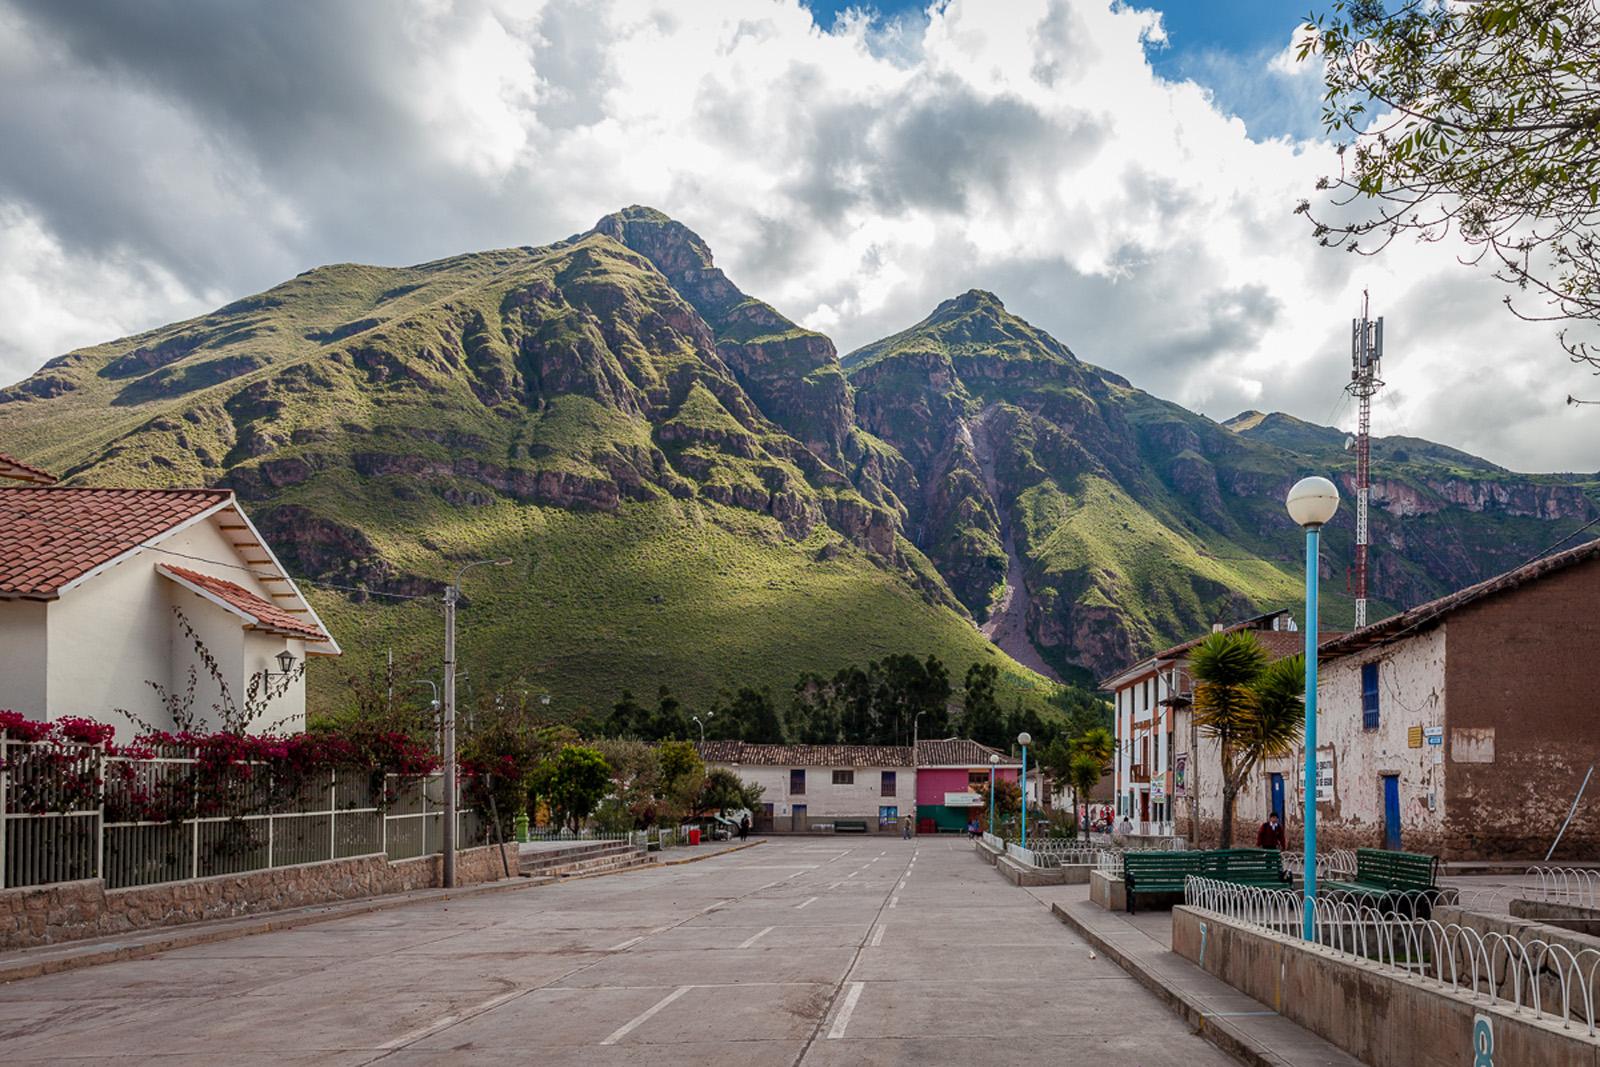 PeruvianHearts_ThomasDuncan_PhotographersWithoutBorders